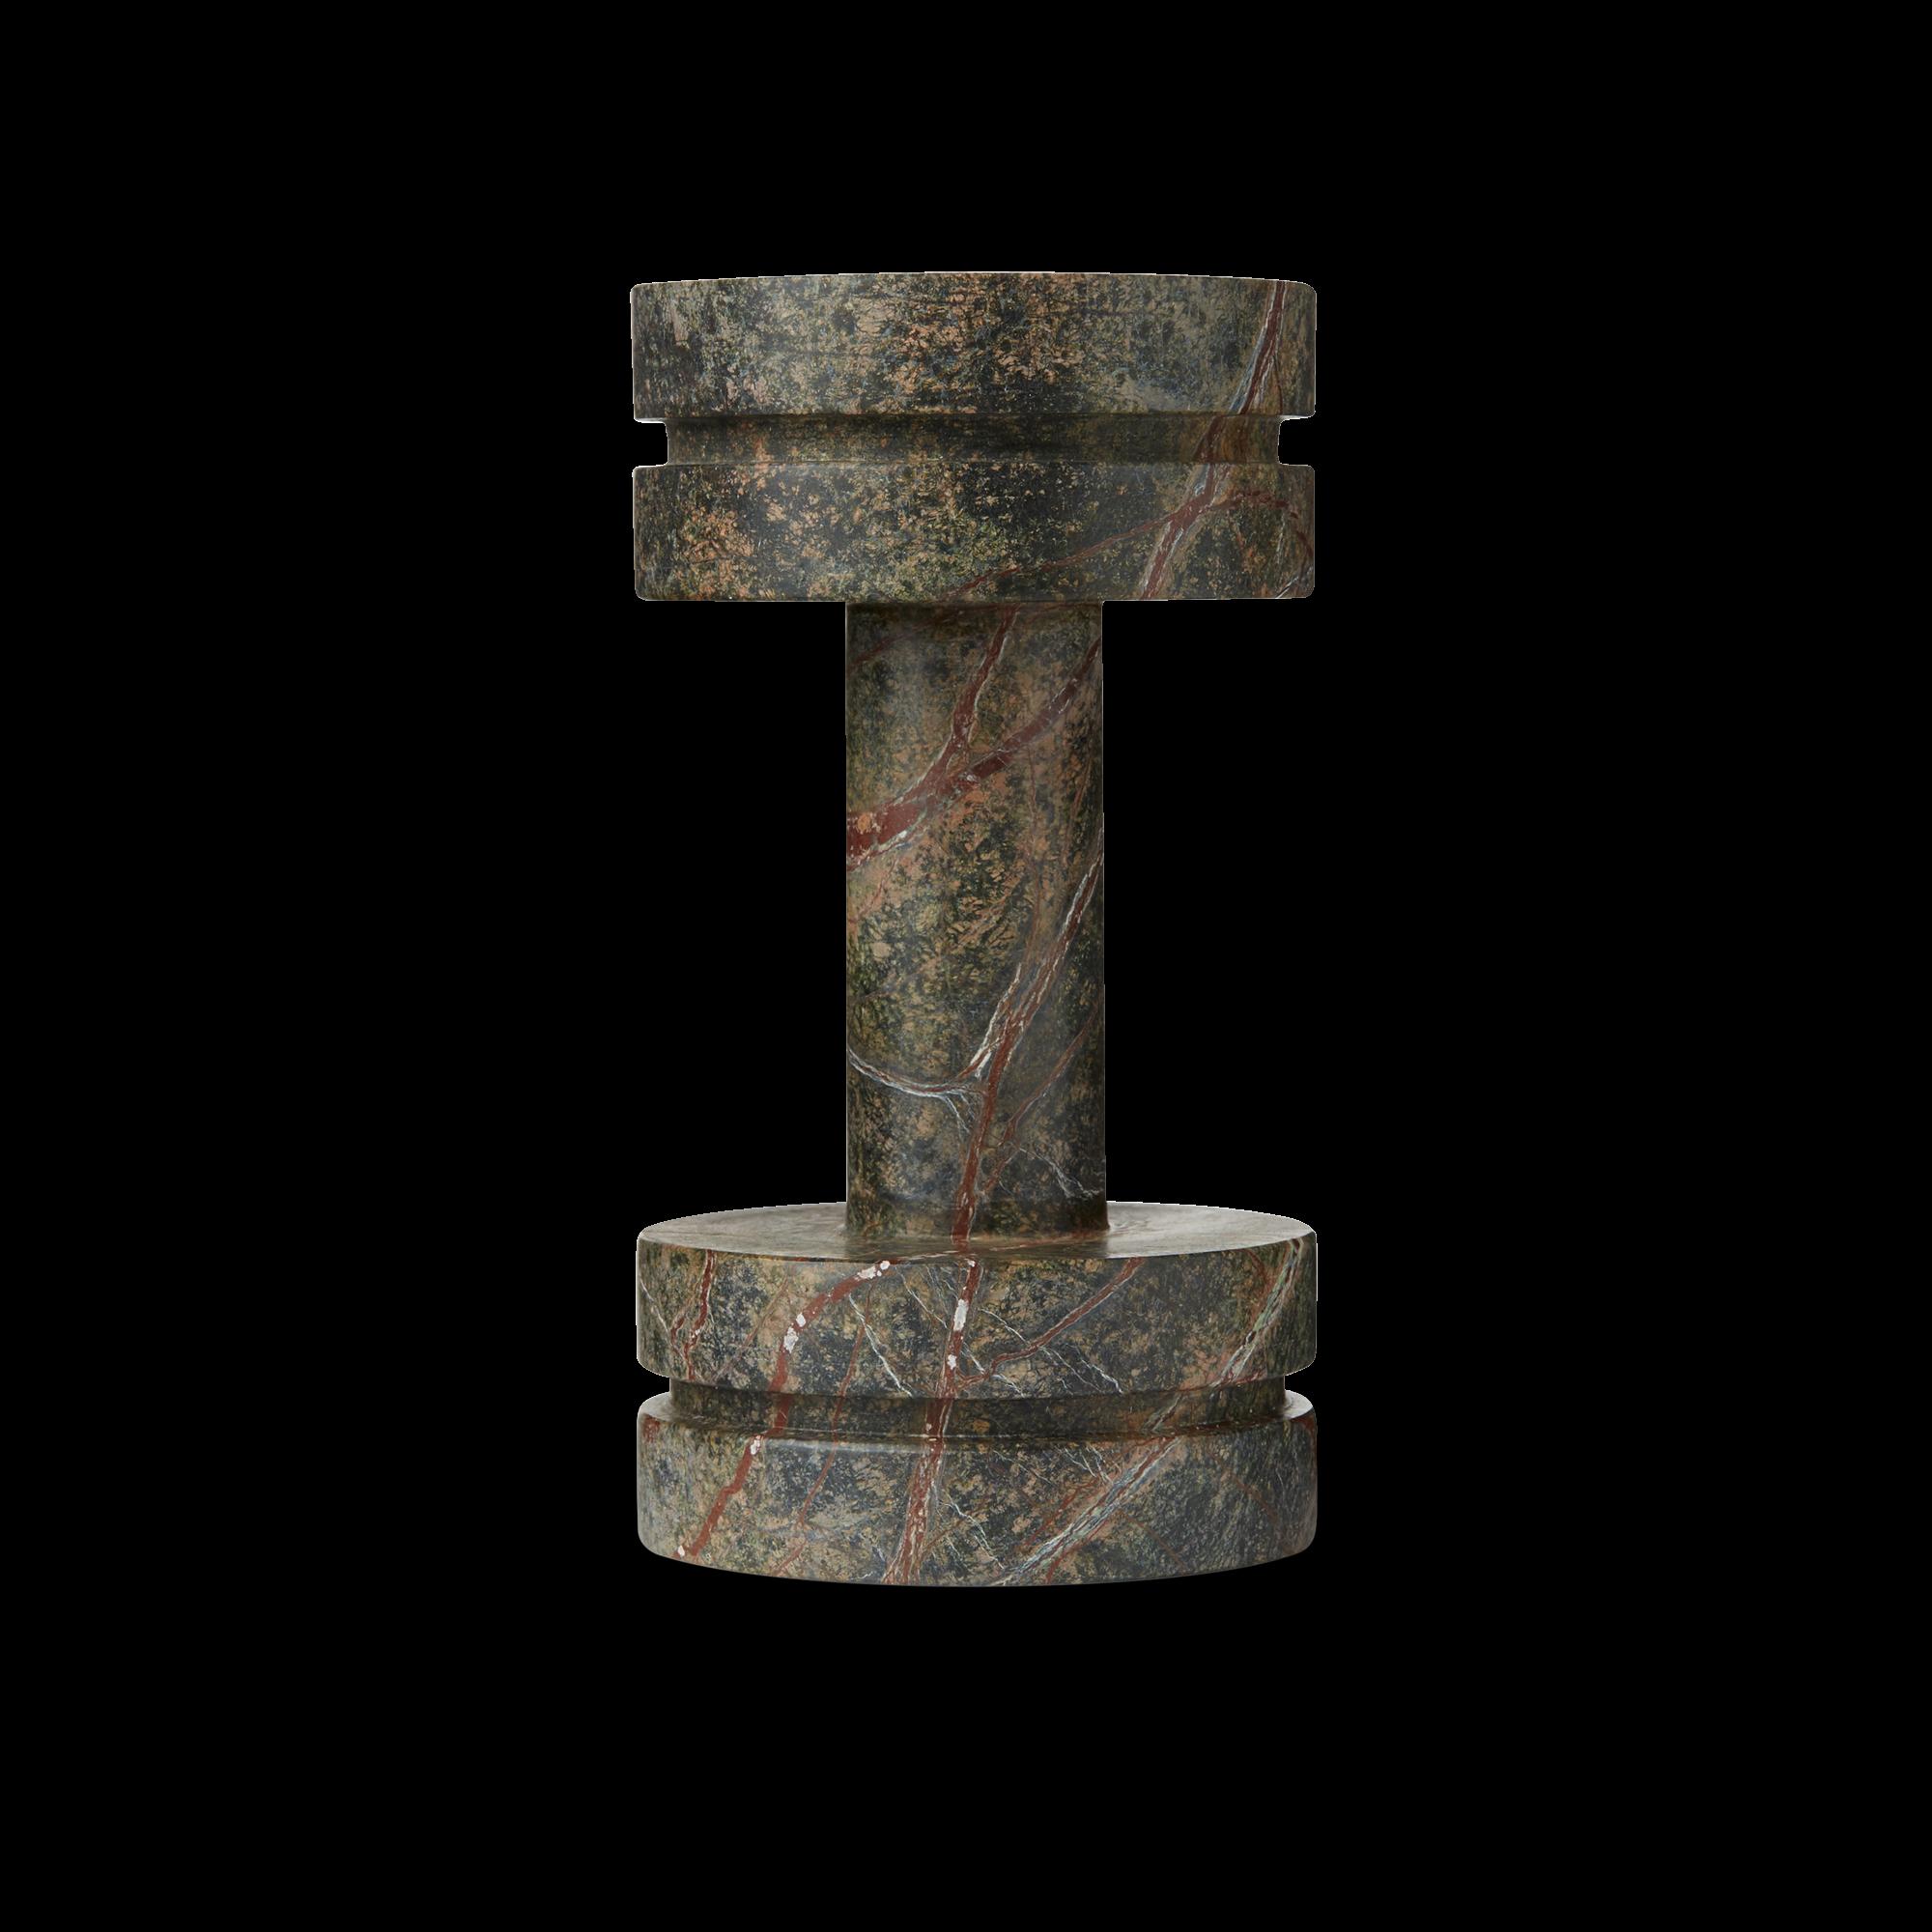 tom-dixon-stone-dumbell-2.5